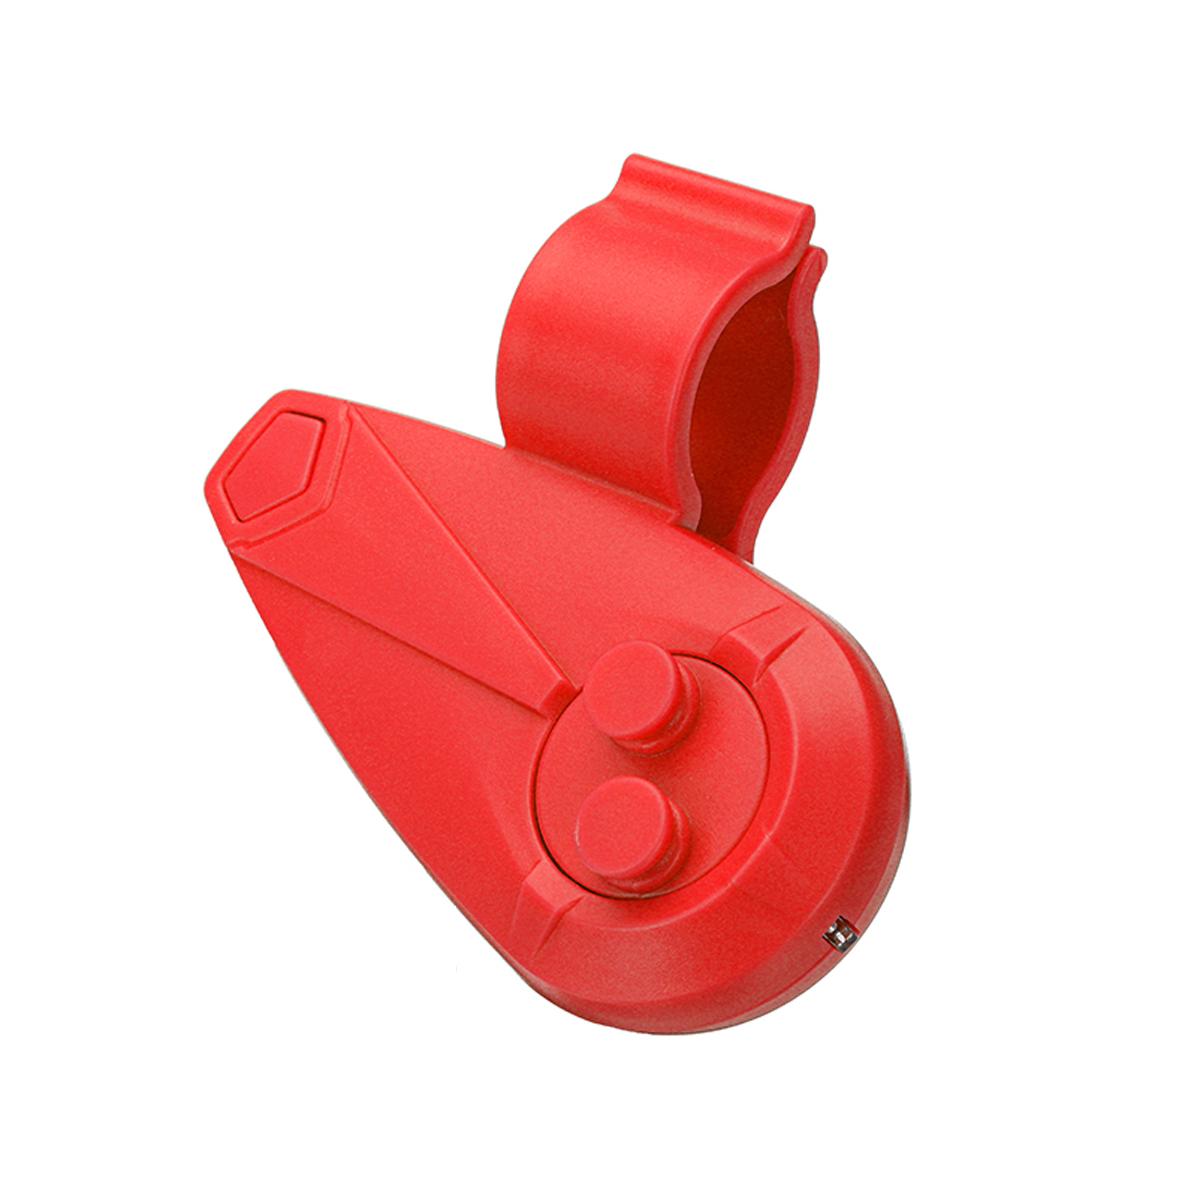 BluetoothЭлектронныйСветодиодныйРыбалкаБудильникBite Sound Alarm Bell ABS Rob Clip Reminder - фото 6